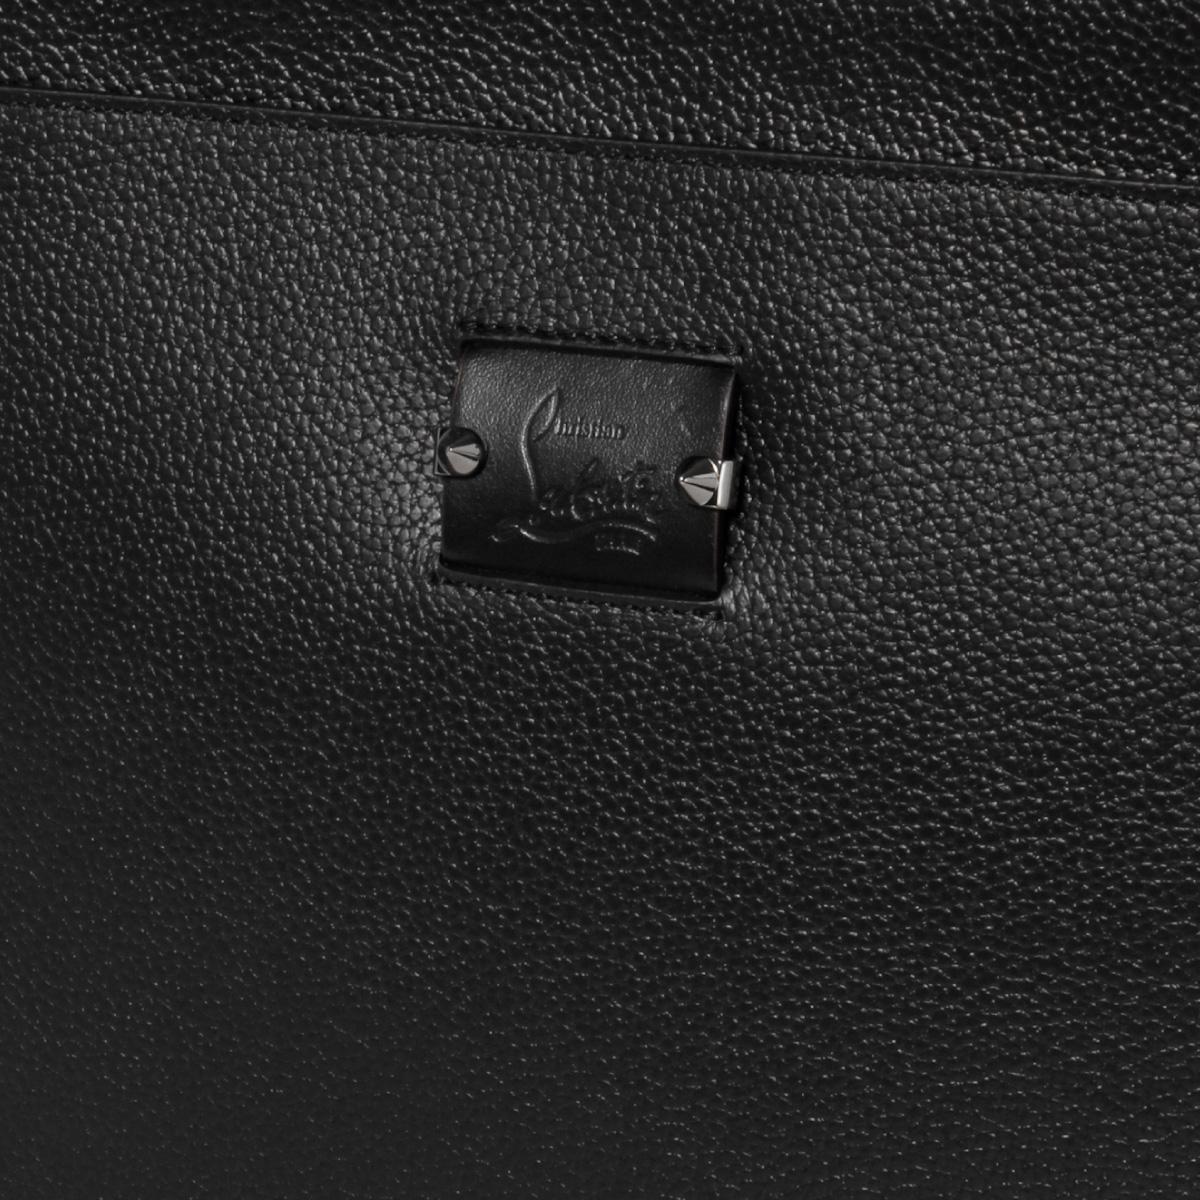 8e0b1b31a4 ... 3185087 クリスチャンルブタン Christian Louboutin bag men B078 shoulders clutch bag  SKYPOUCH LOUBICITY sky porch agate ...